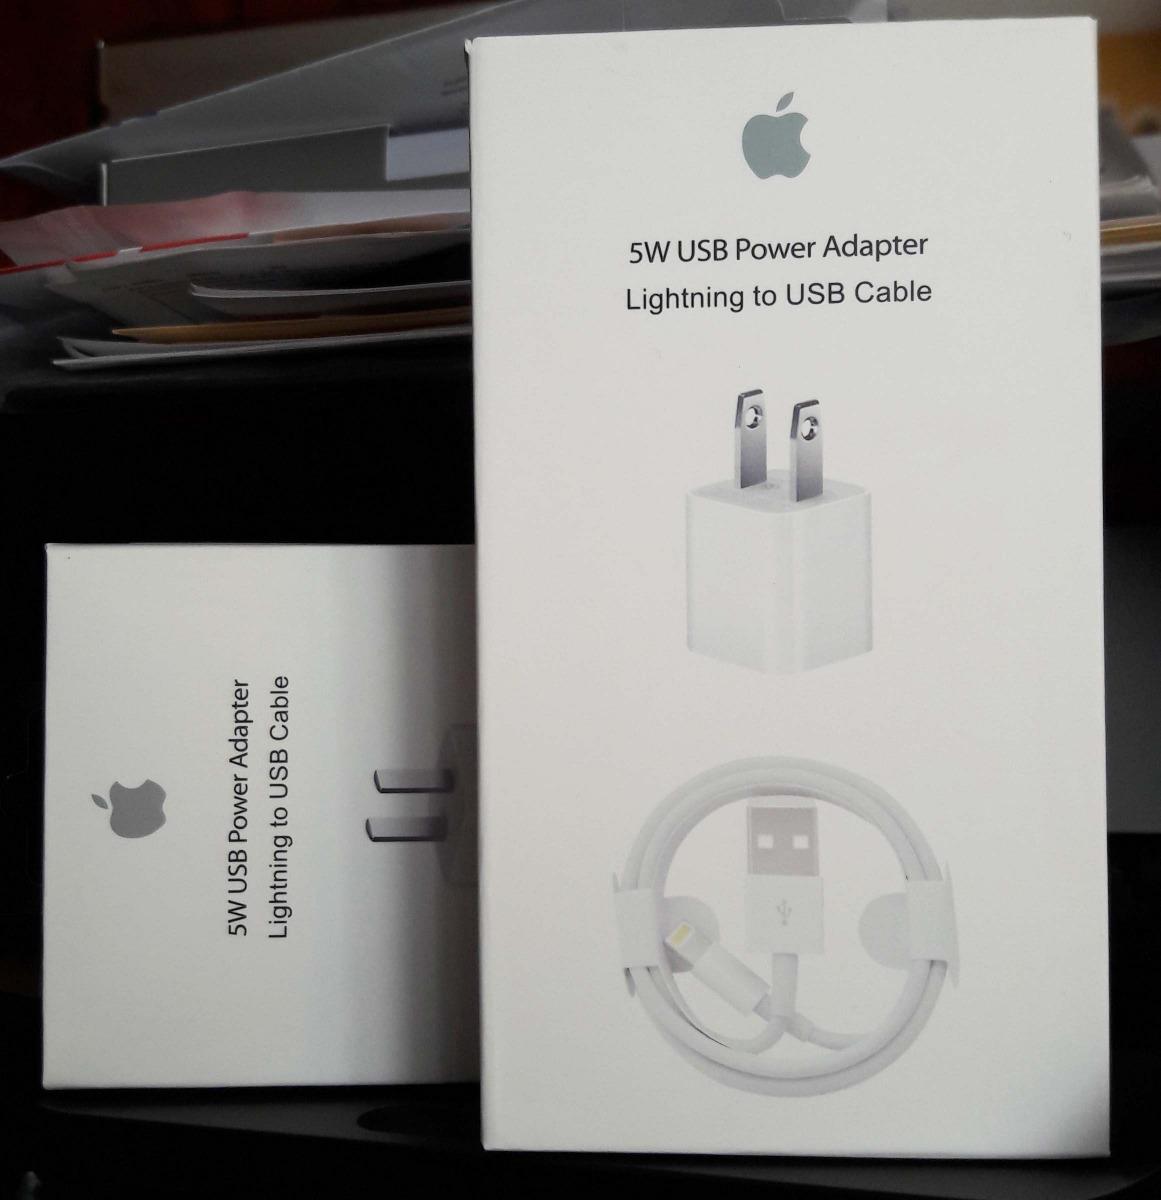 56e3fd59372 Kit Lightning 2 En 1 Para iPhone iPad Foxconn Original - $ 349.00 en ...